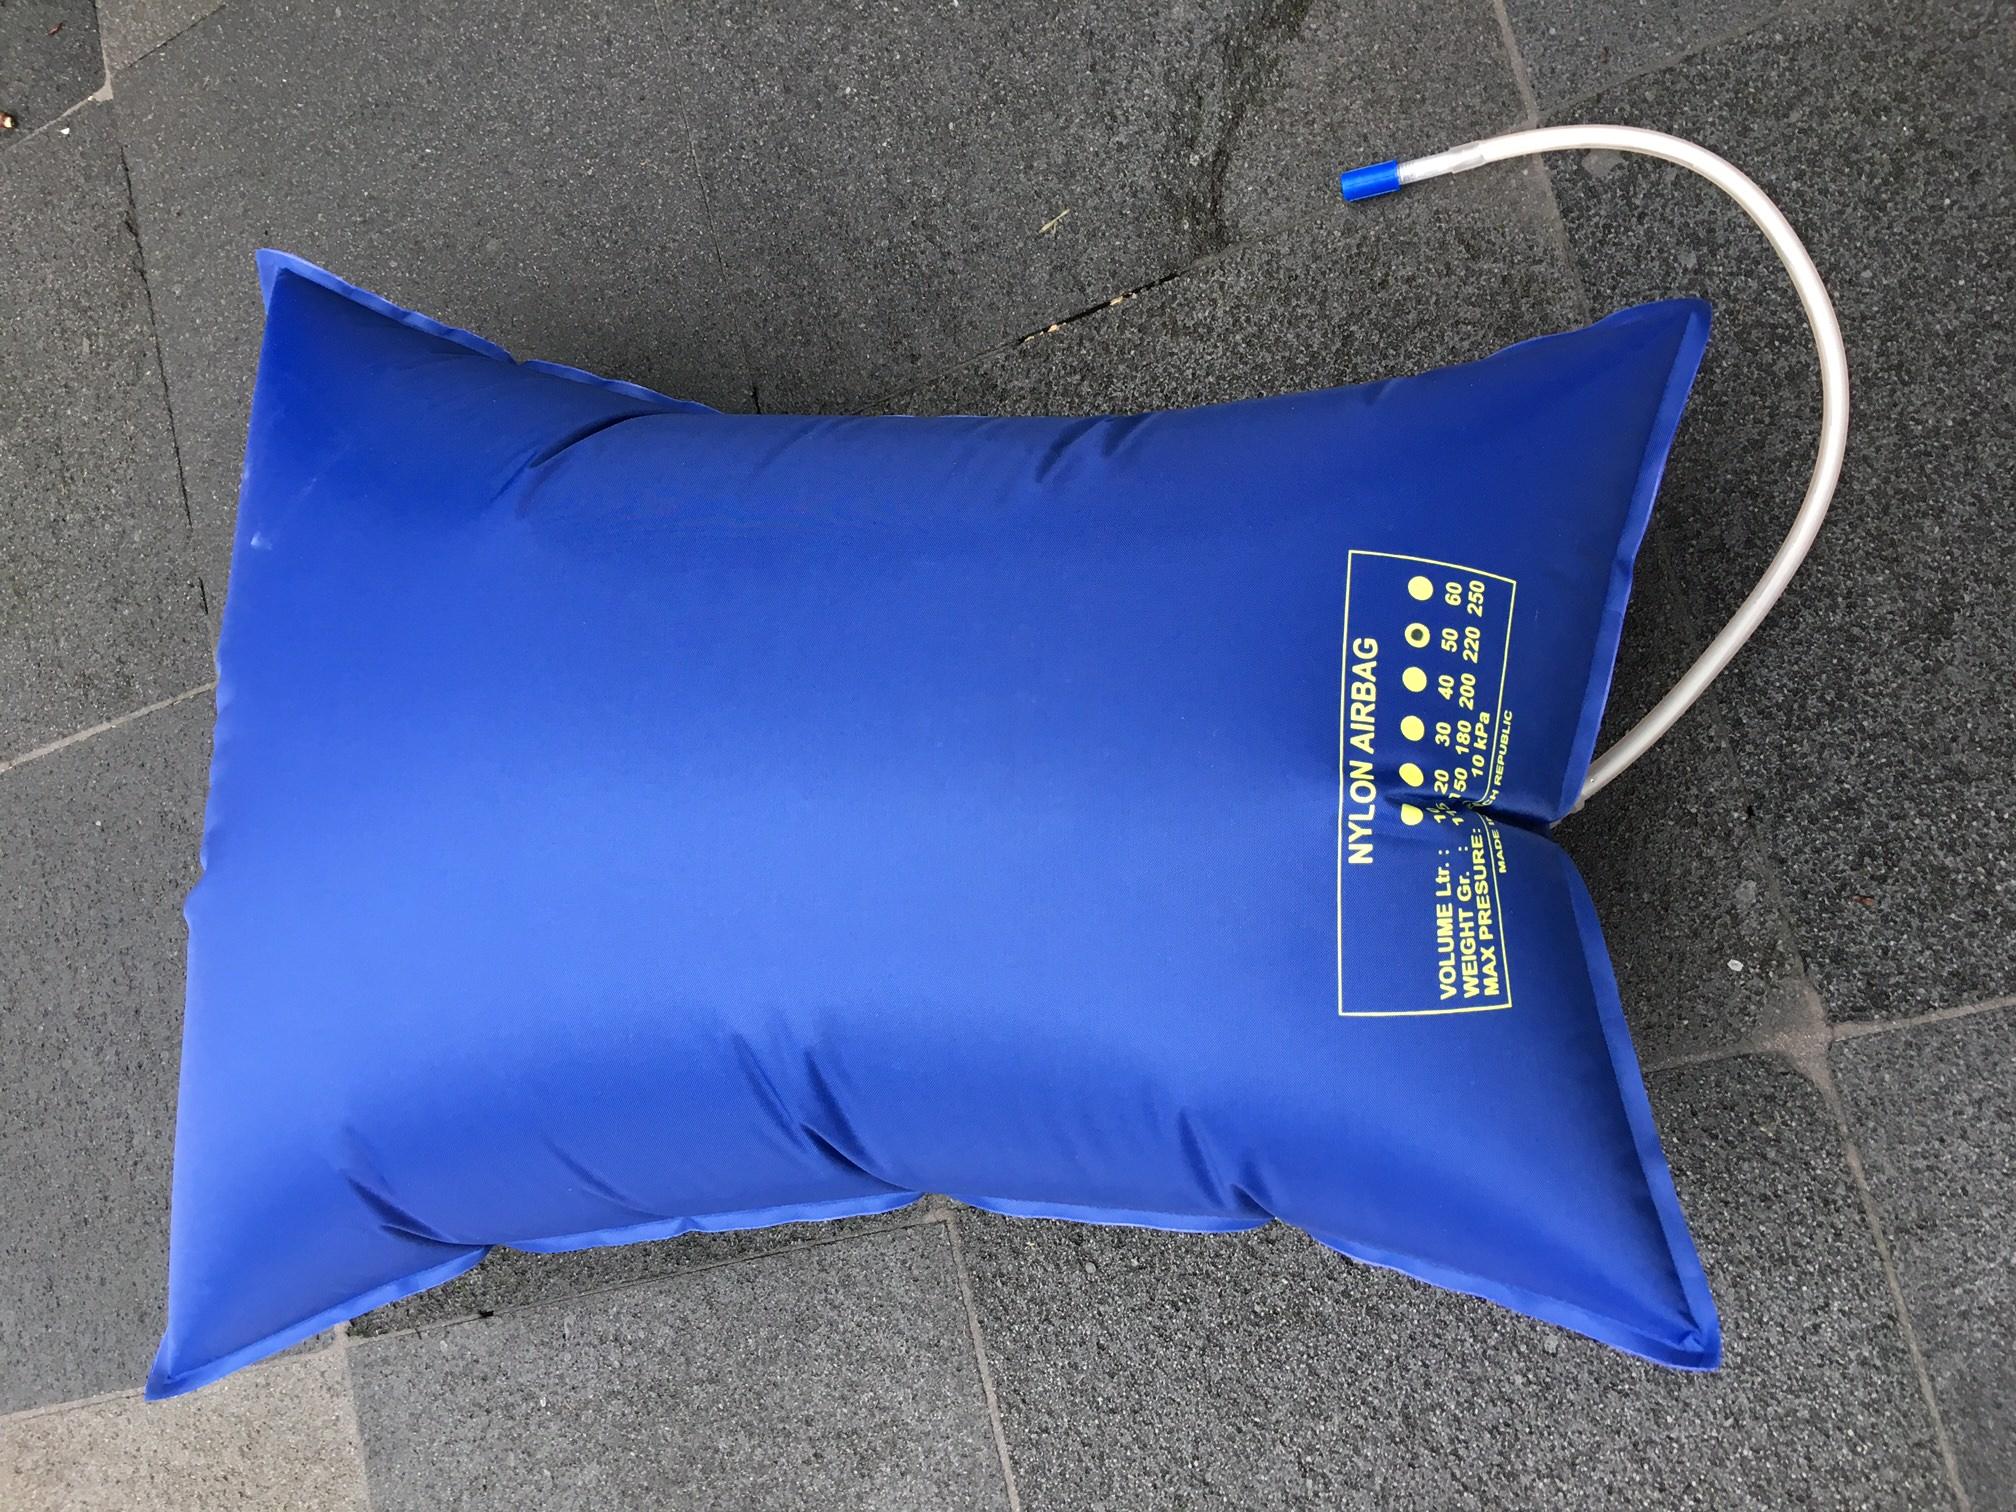 Canoe/Kayak Inflatable Buoyancy Bag by KTW